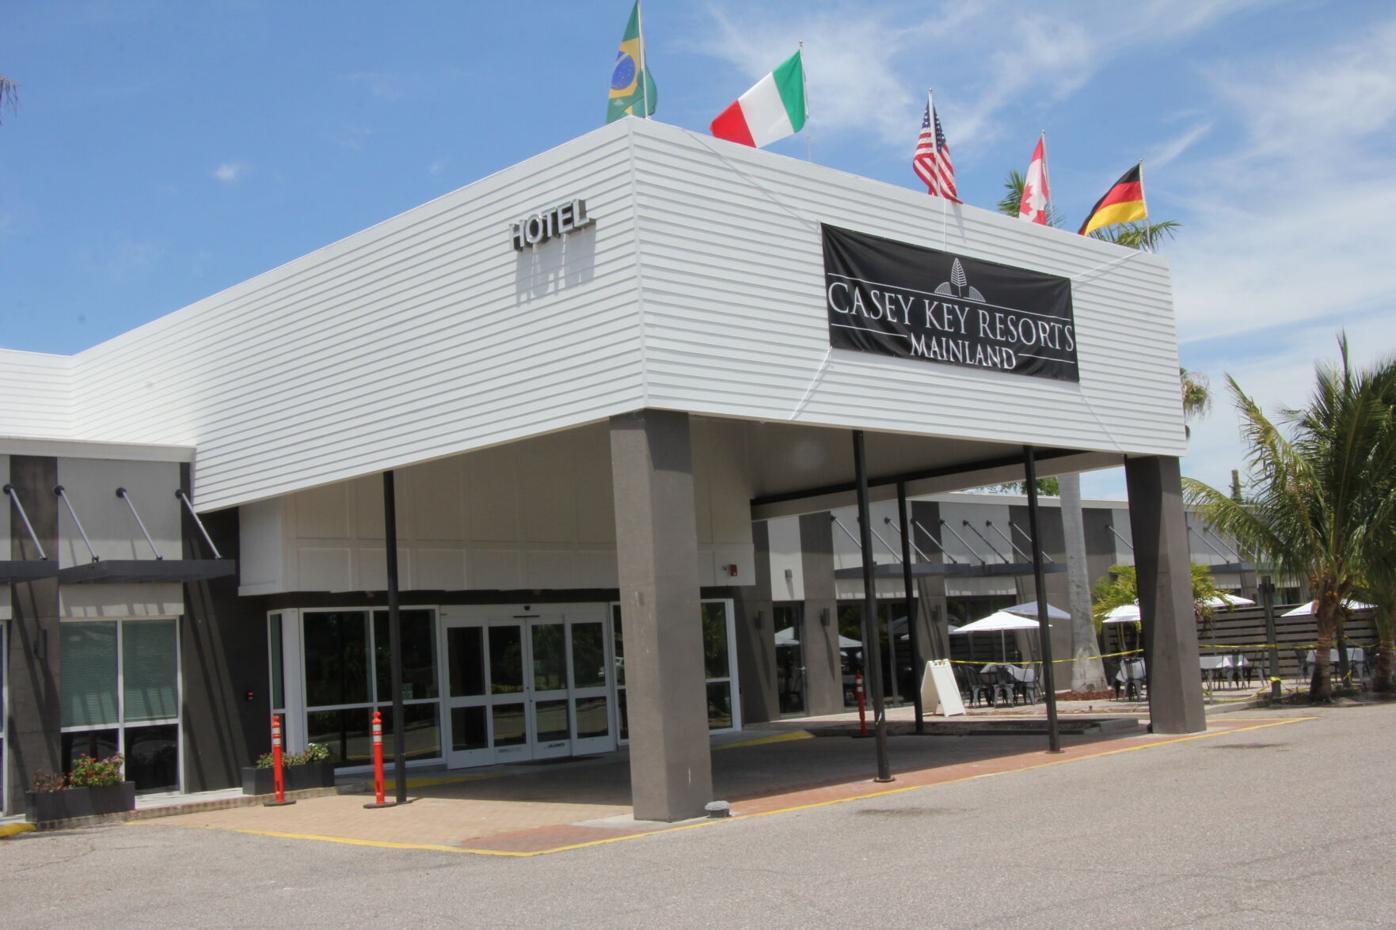 Casey Key Resorts Mainland